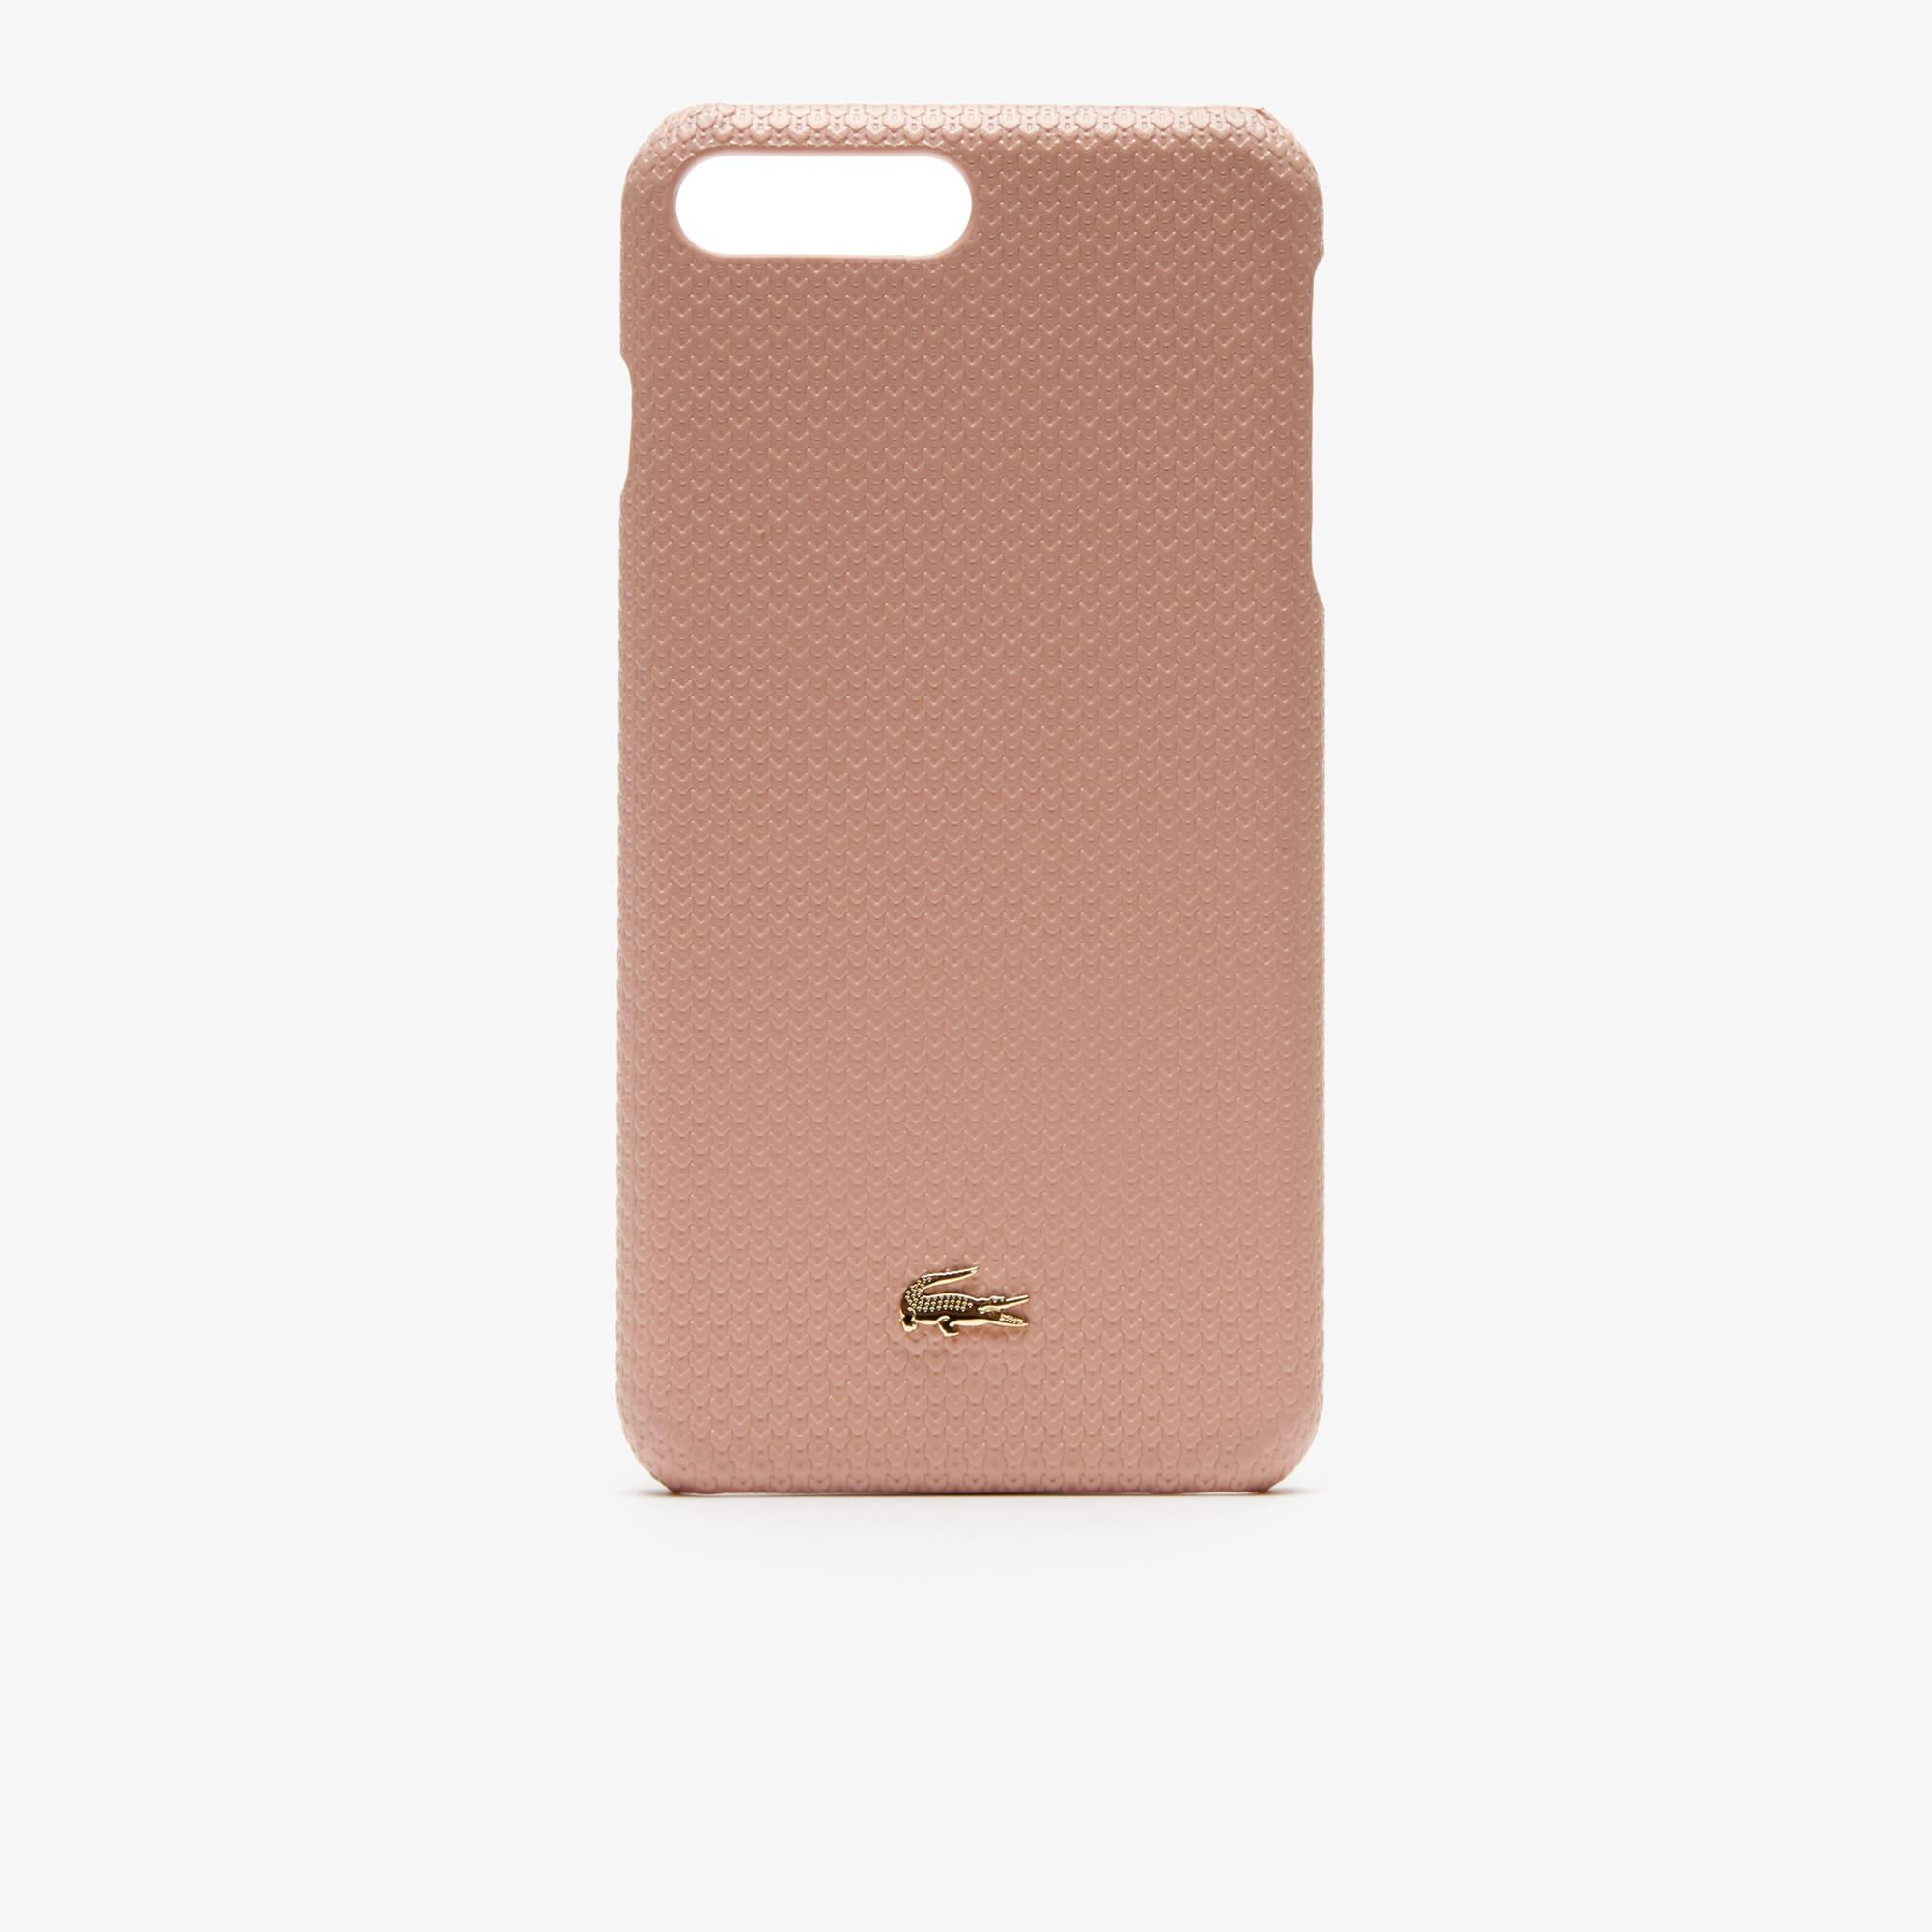 iphone 8 coque lacoste